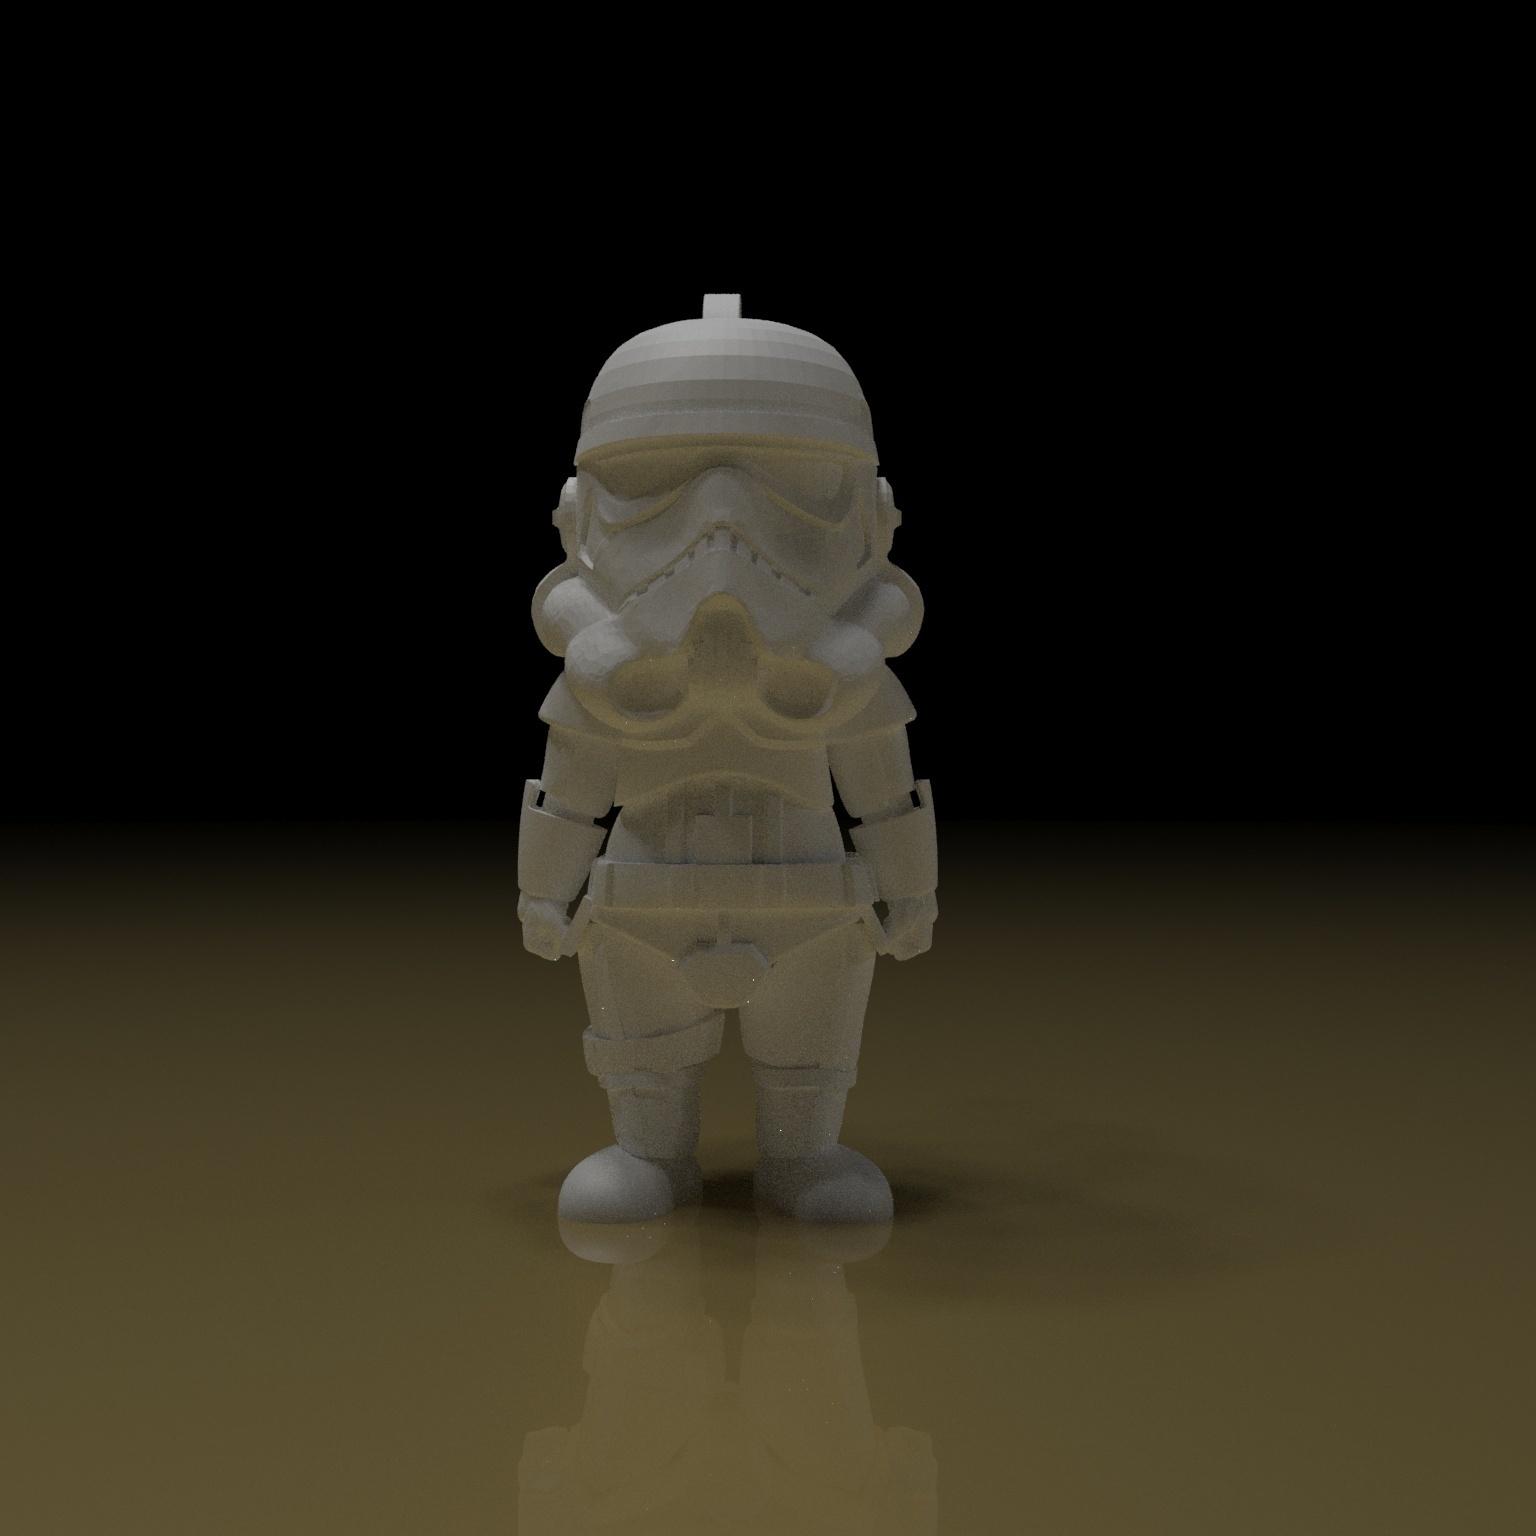 1.jpg Download free STL file STORMTROOPER KEY CHAIN • 3D printing template, paltony22